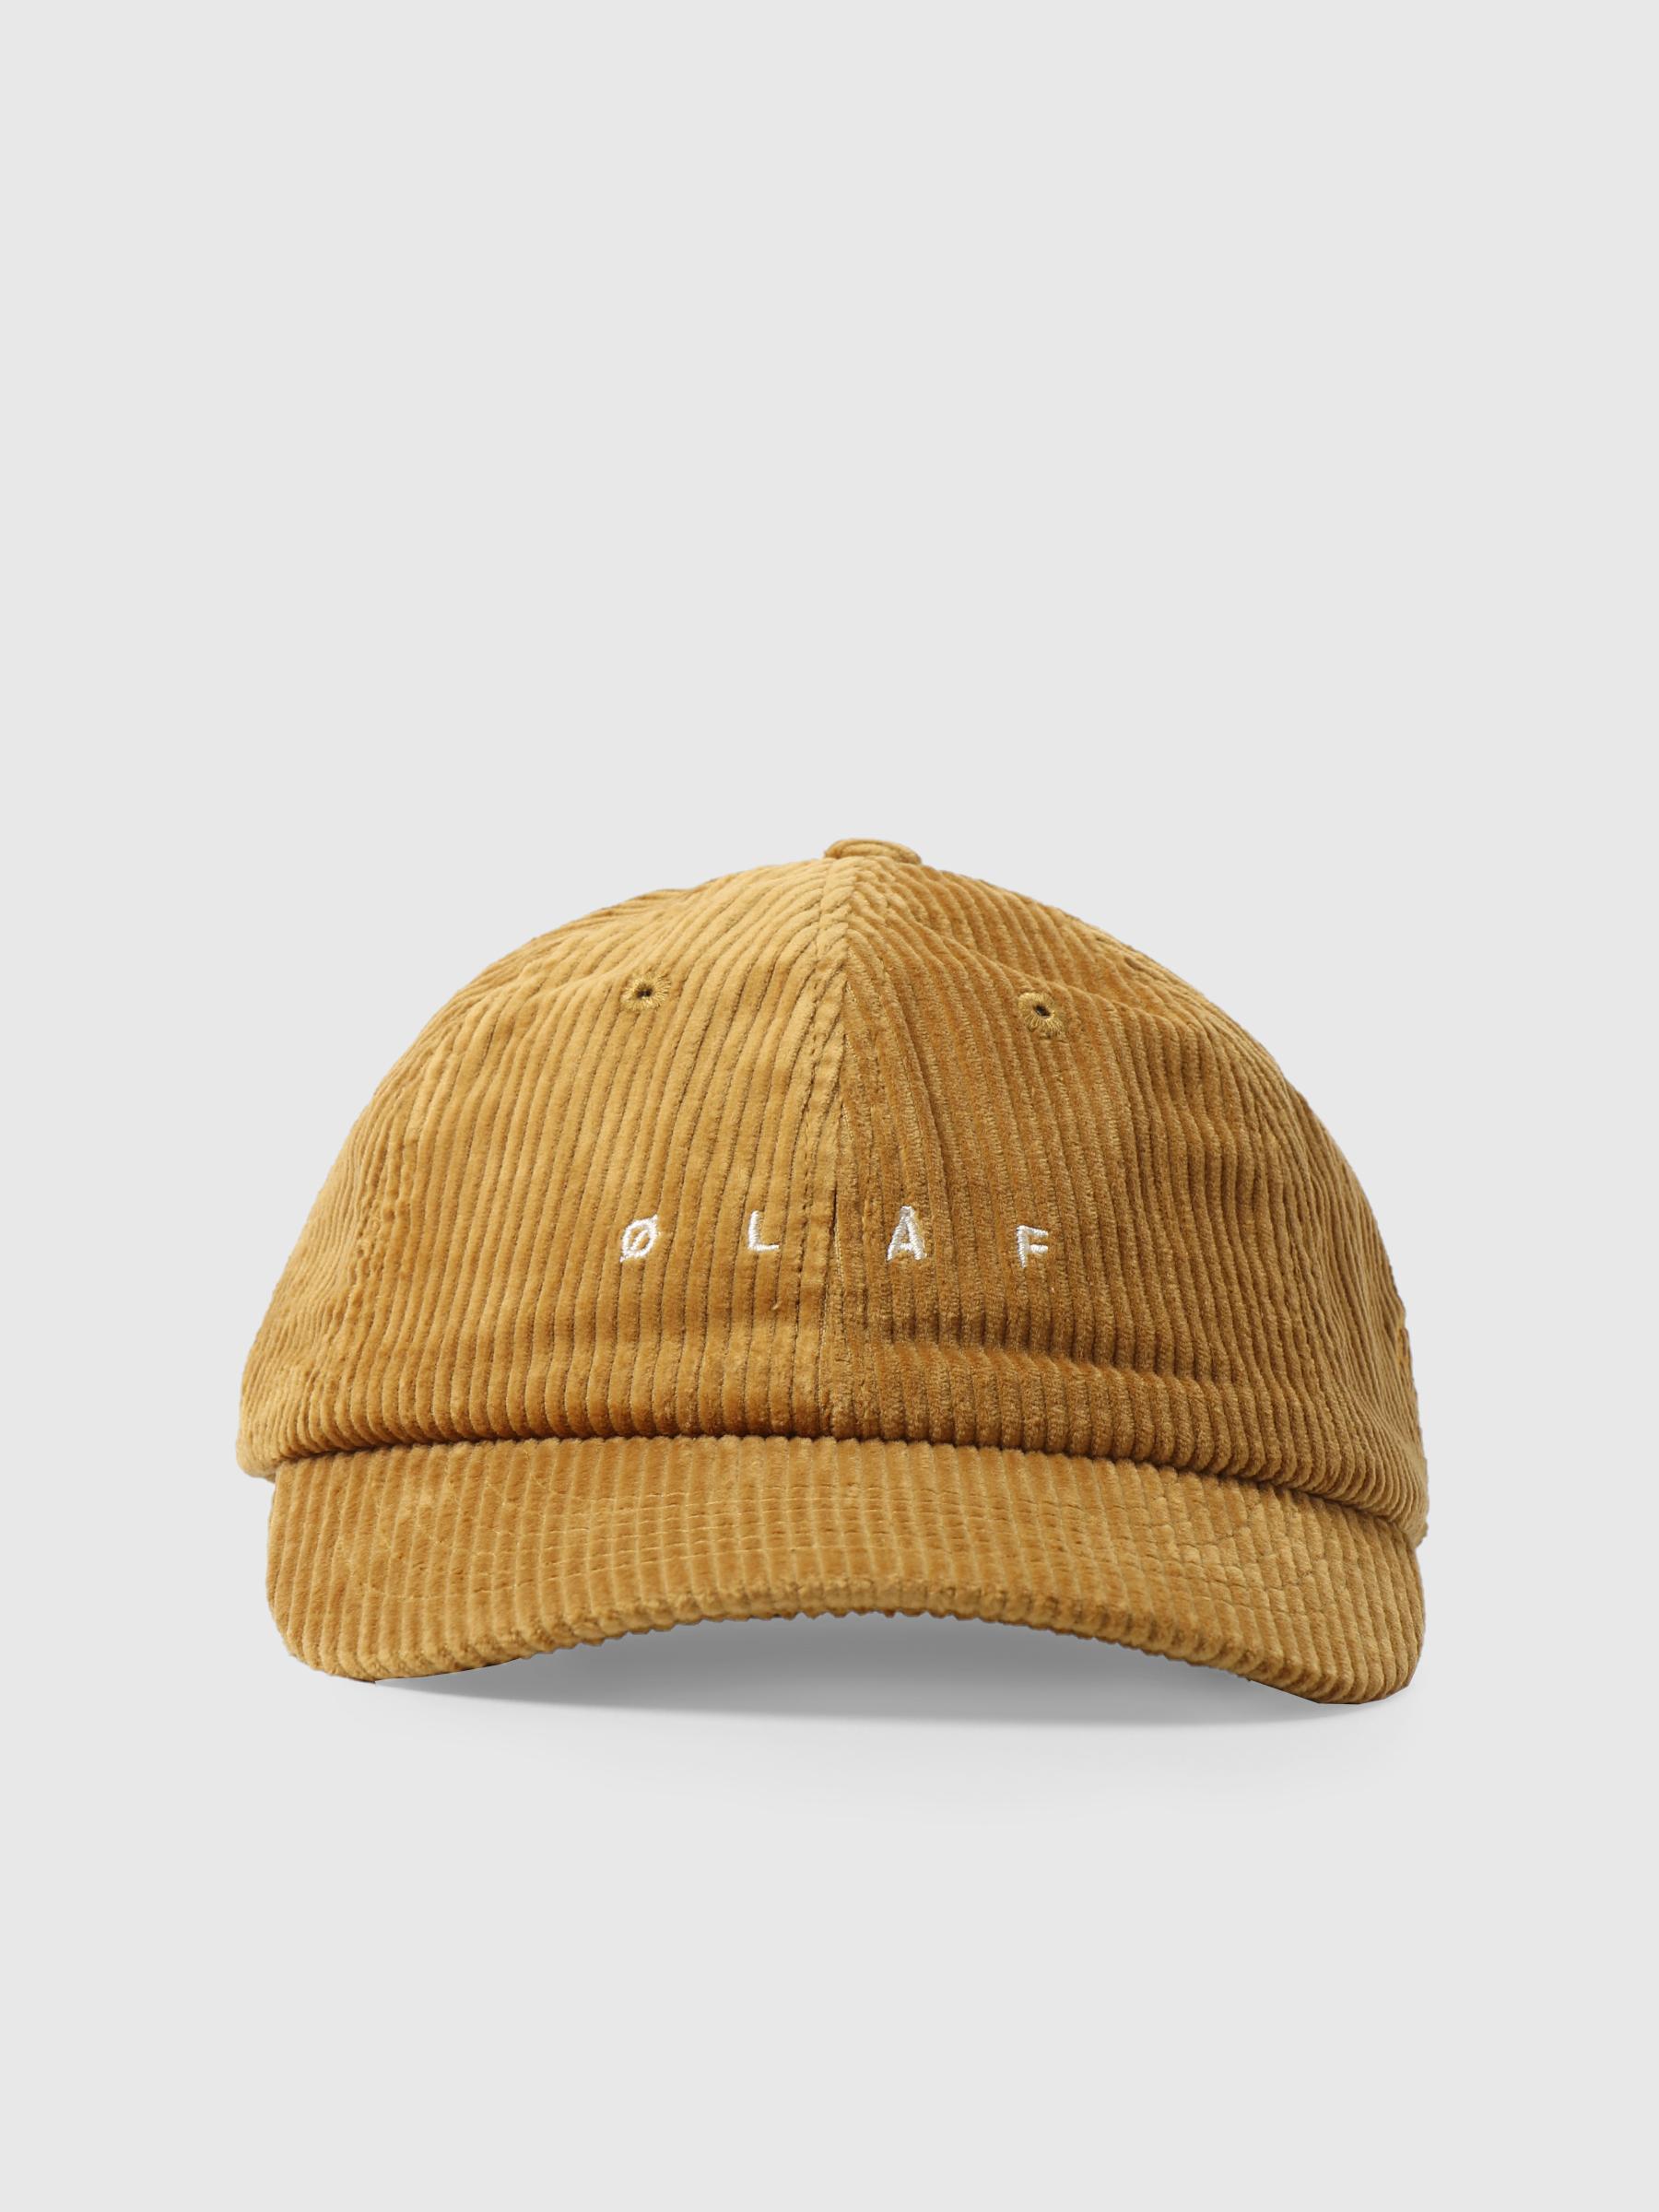 OLAF Corduroy Cap Golden Palm